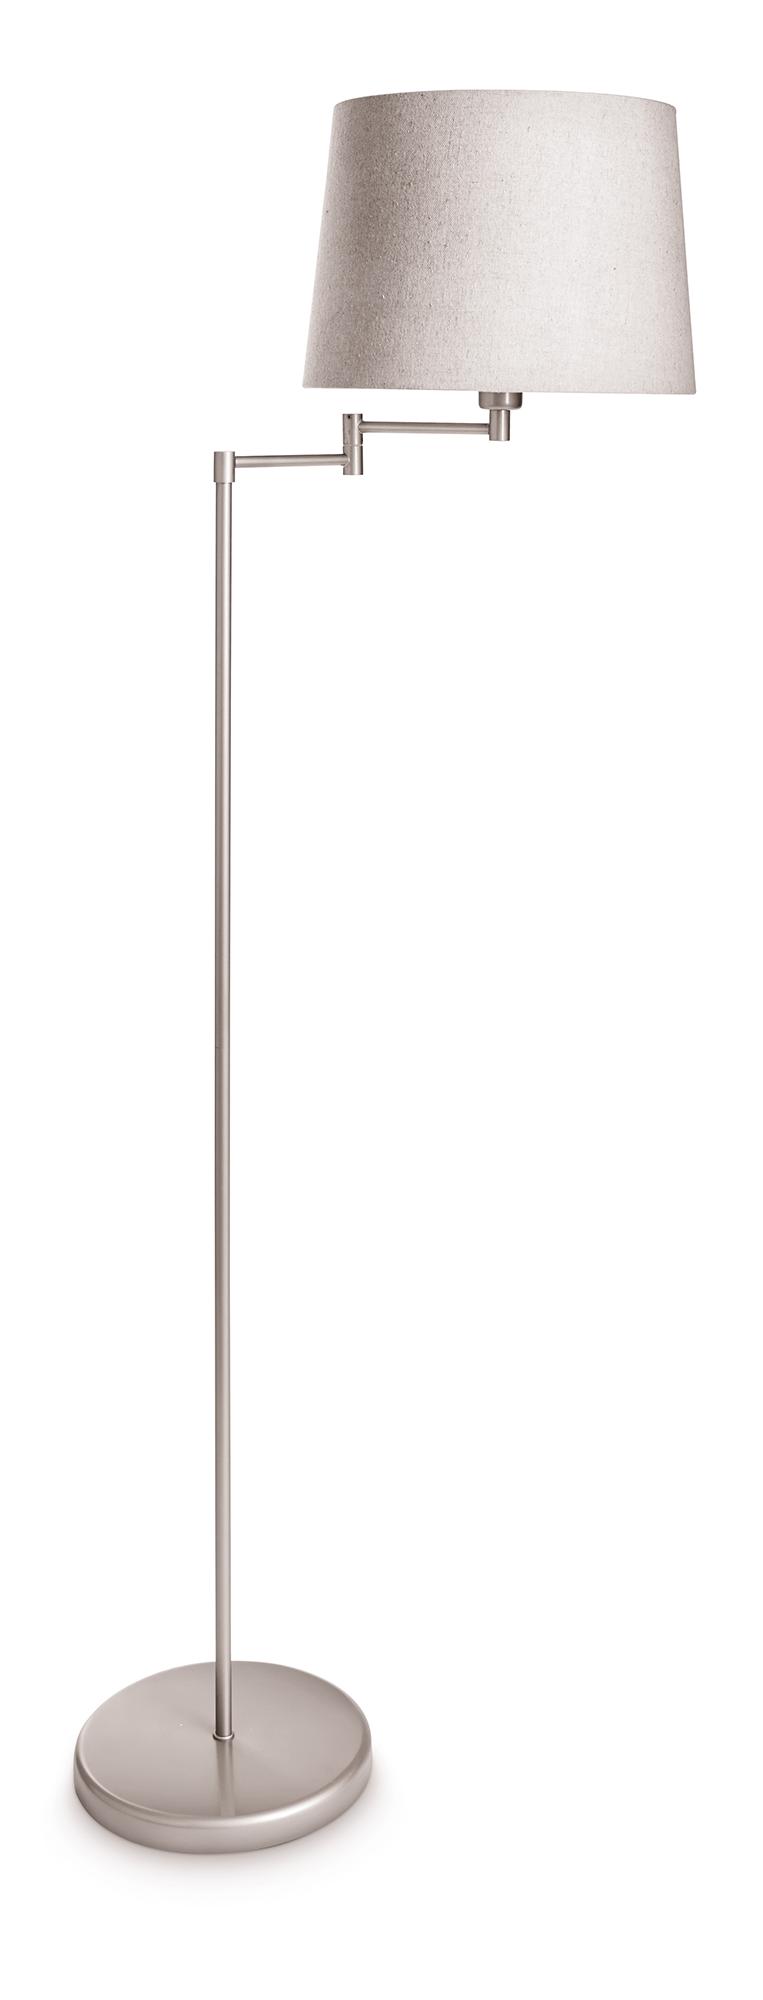 philips myliving donne stehleuchte creme beige 3613438e7 beleuchtung. Black Bedroom Furniture Sets. Home Design Ideas